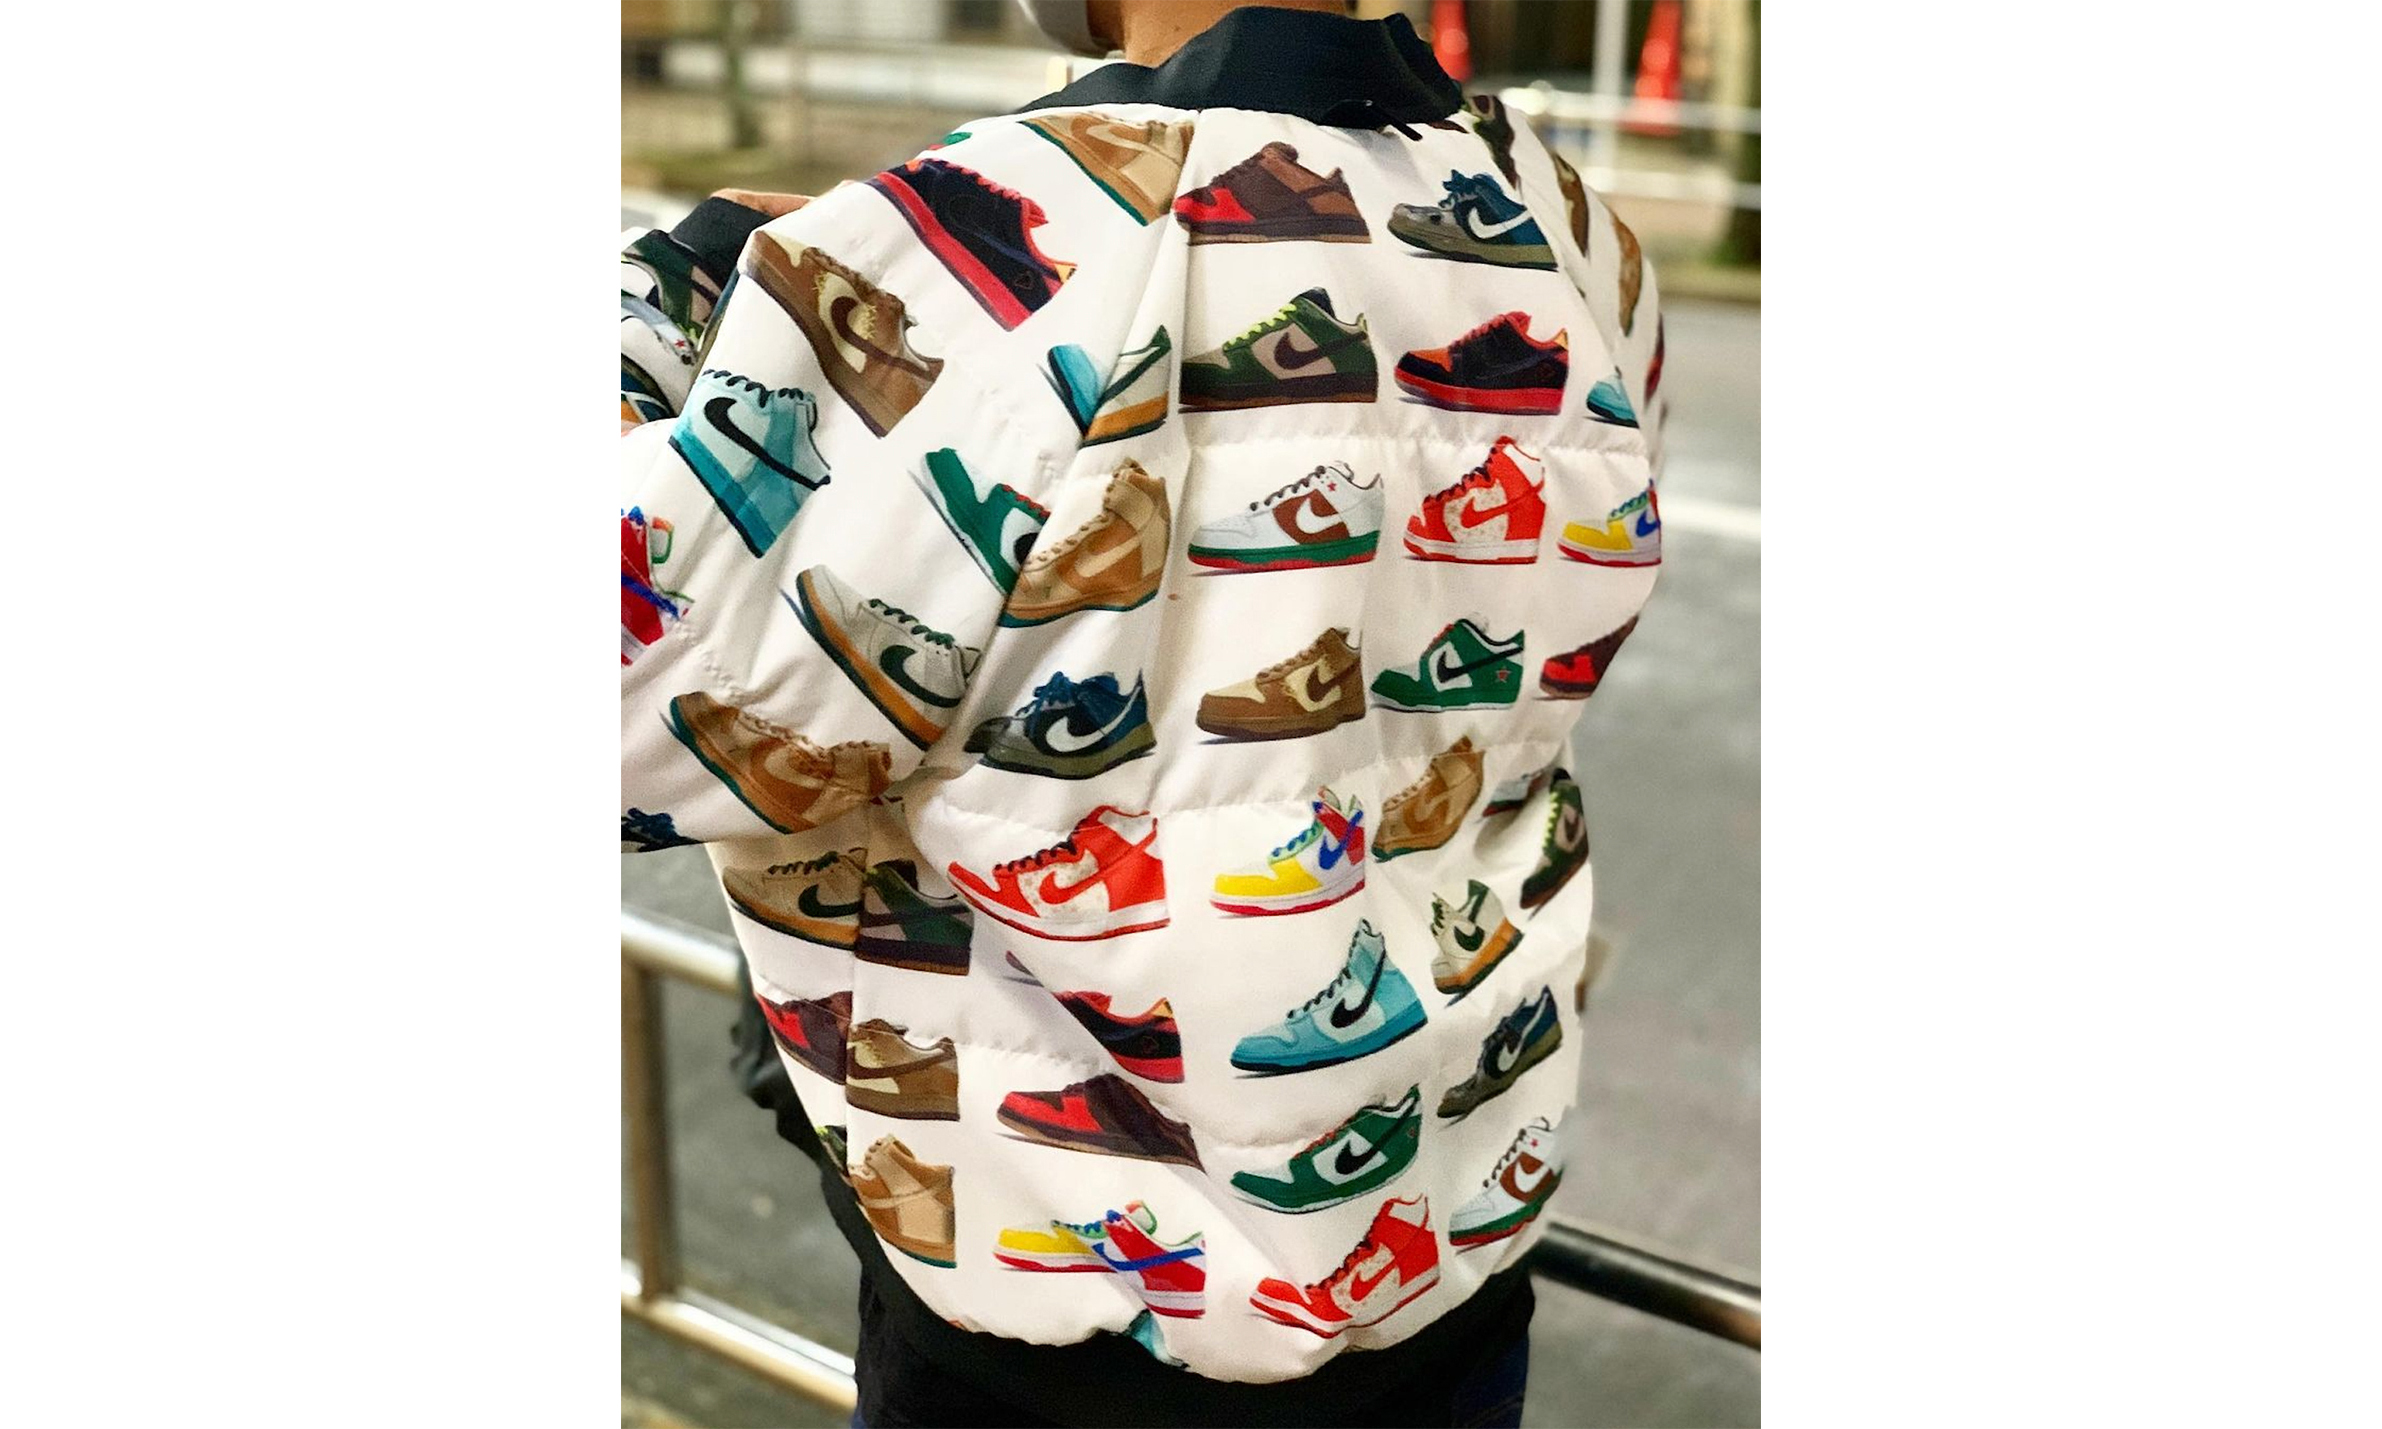 内衬布满 SB Dunk,Nike SB 再度推出 ISO Jacket